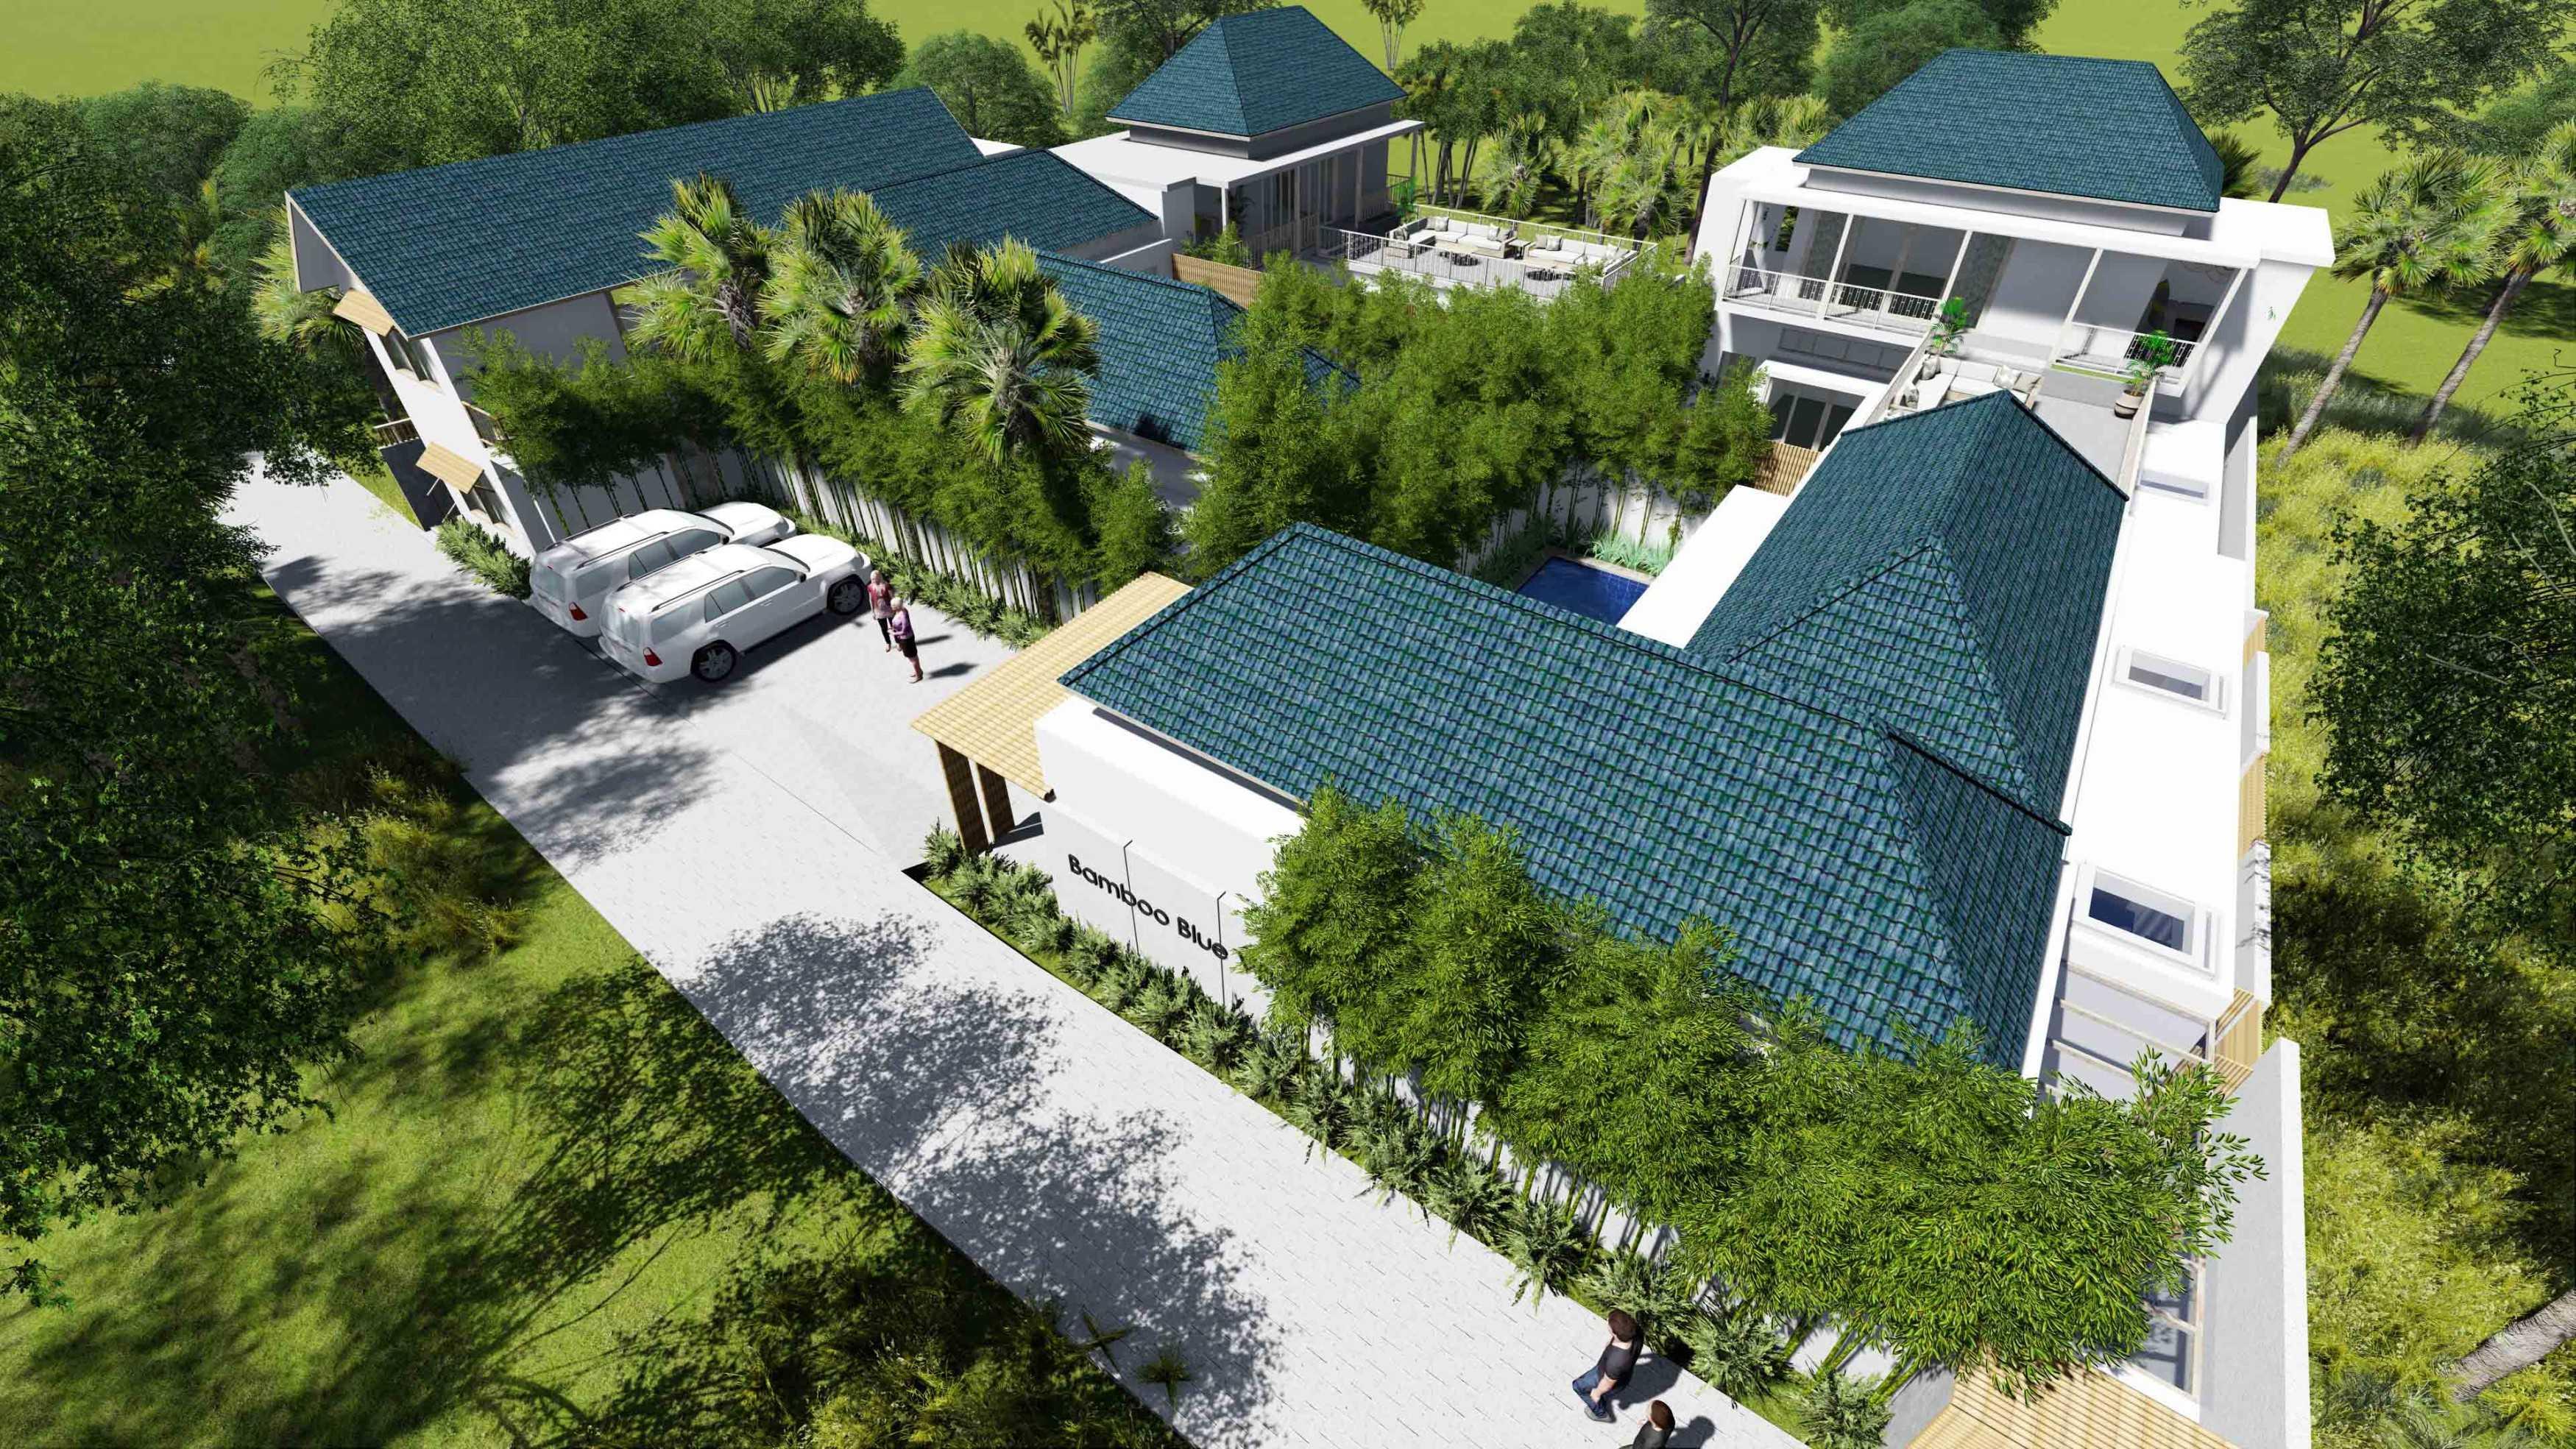 Revan Teggar Bamboo Blue Villa Bali, Indonesia Bali, Indonesia Masterplan Contemporary  107266